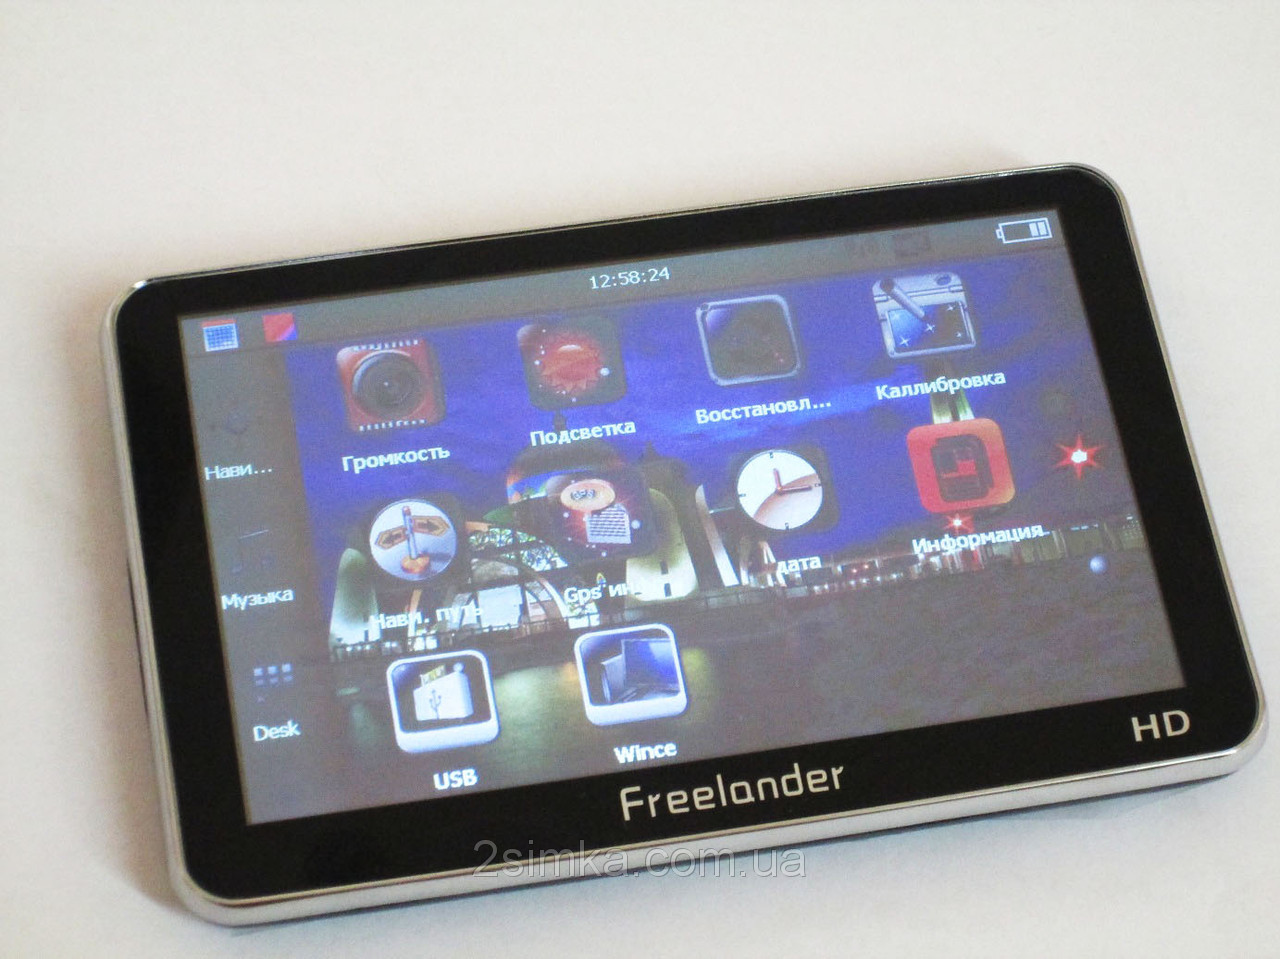 "5"" GPS навигатор Freelander 5033 HD+4Gb встроенная память!!"